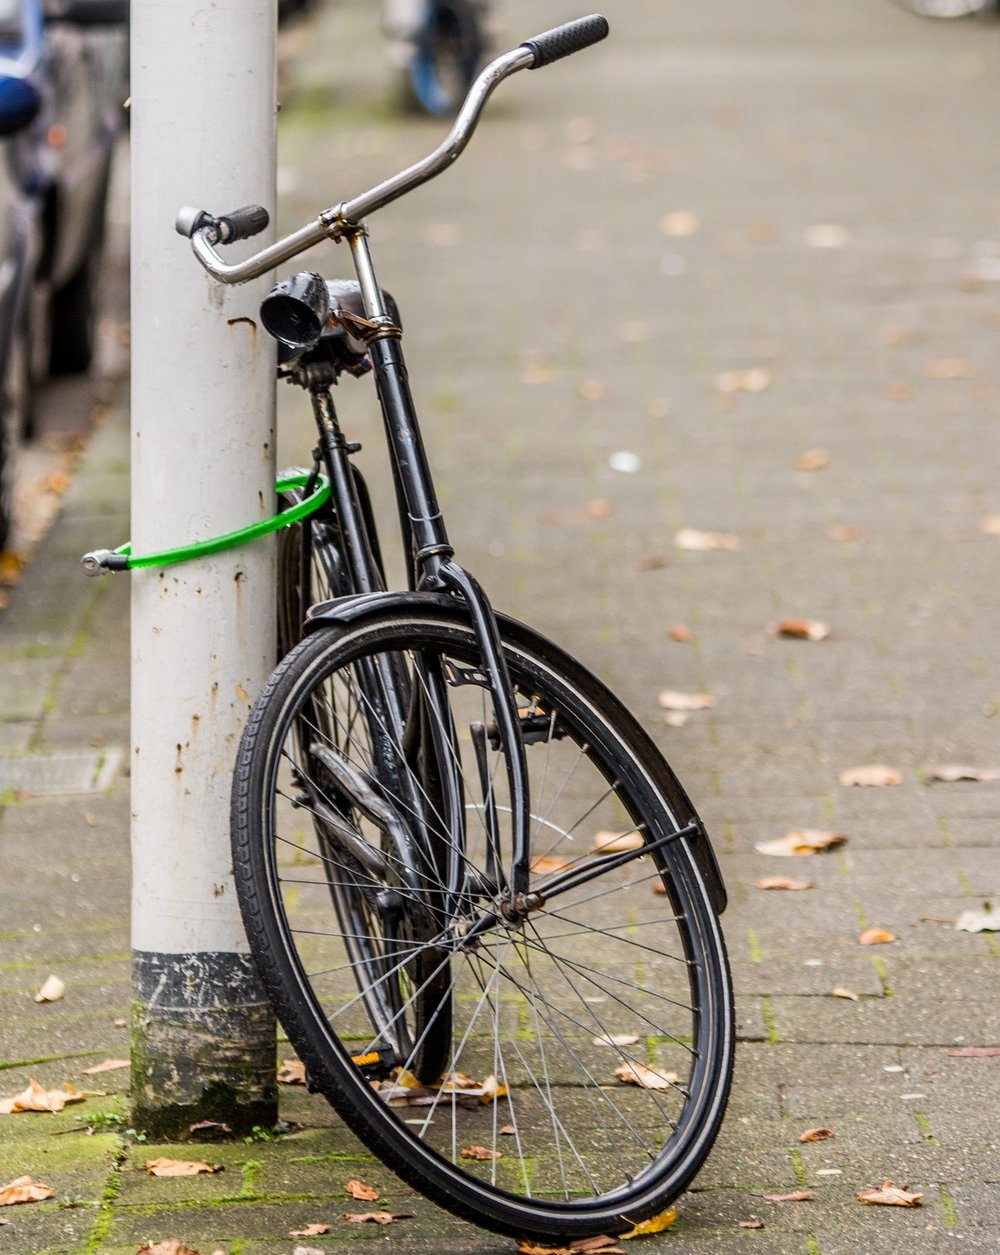 Bike-lockout-services-oregon.jpg